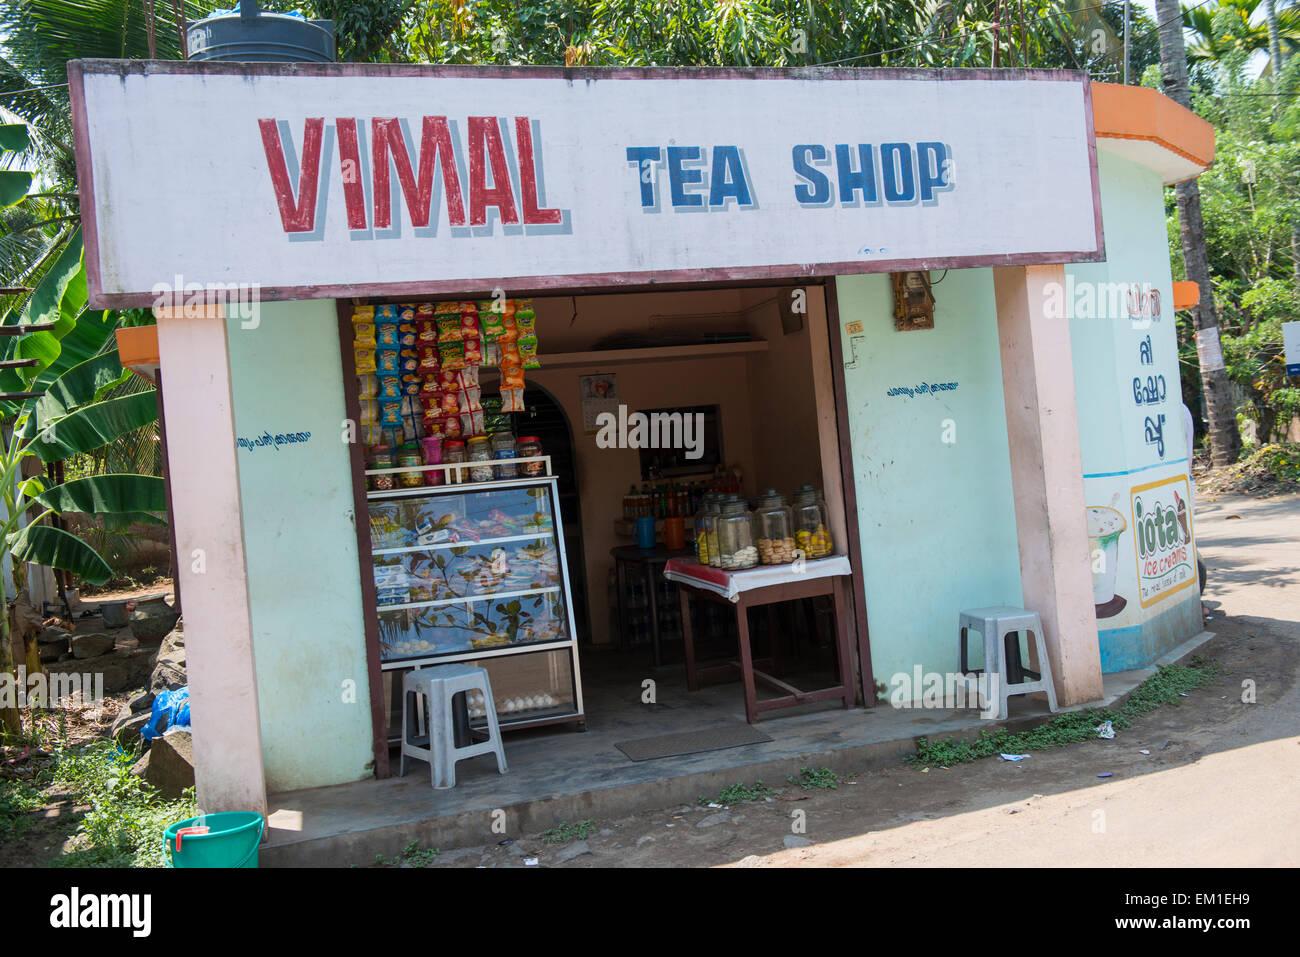 Kerala Tea Shop High Resolution Stock Photography And Images Alamy